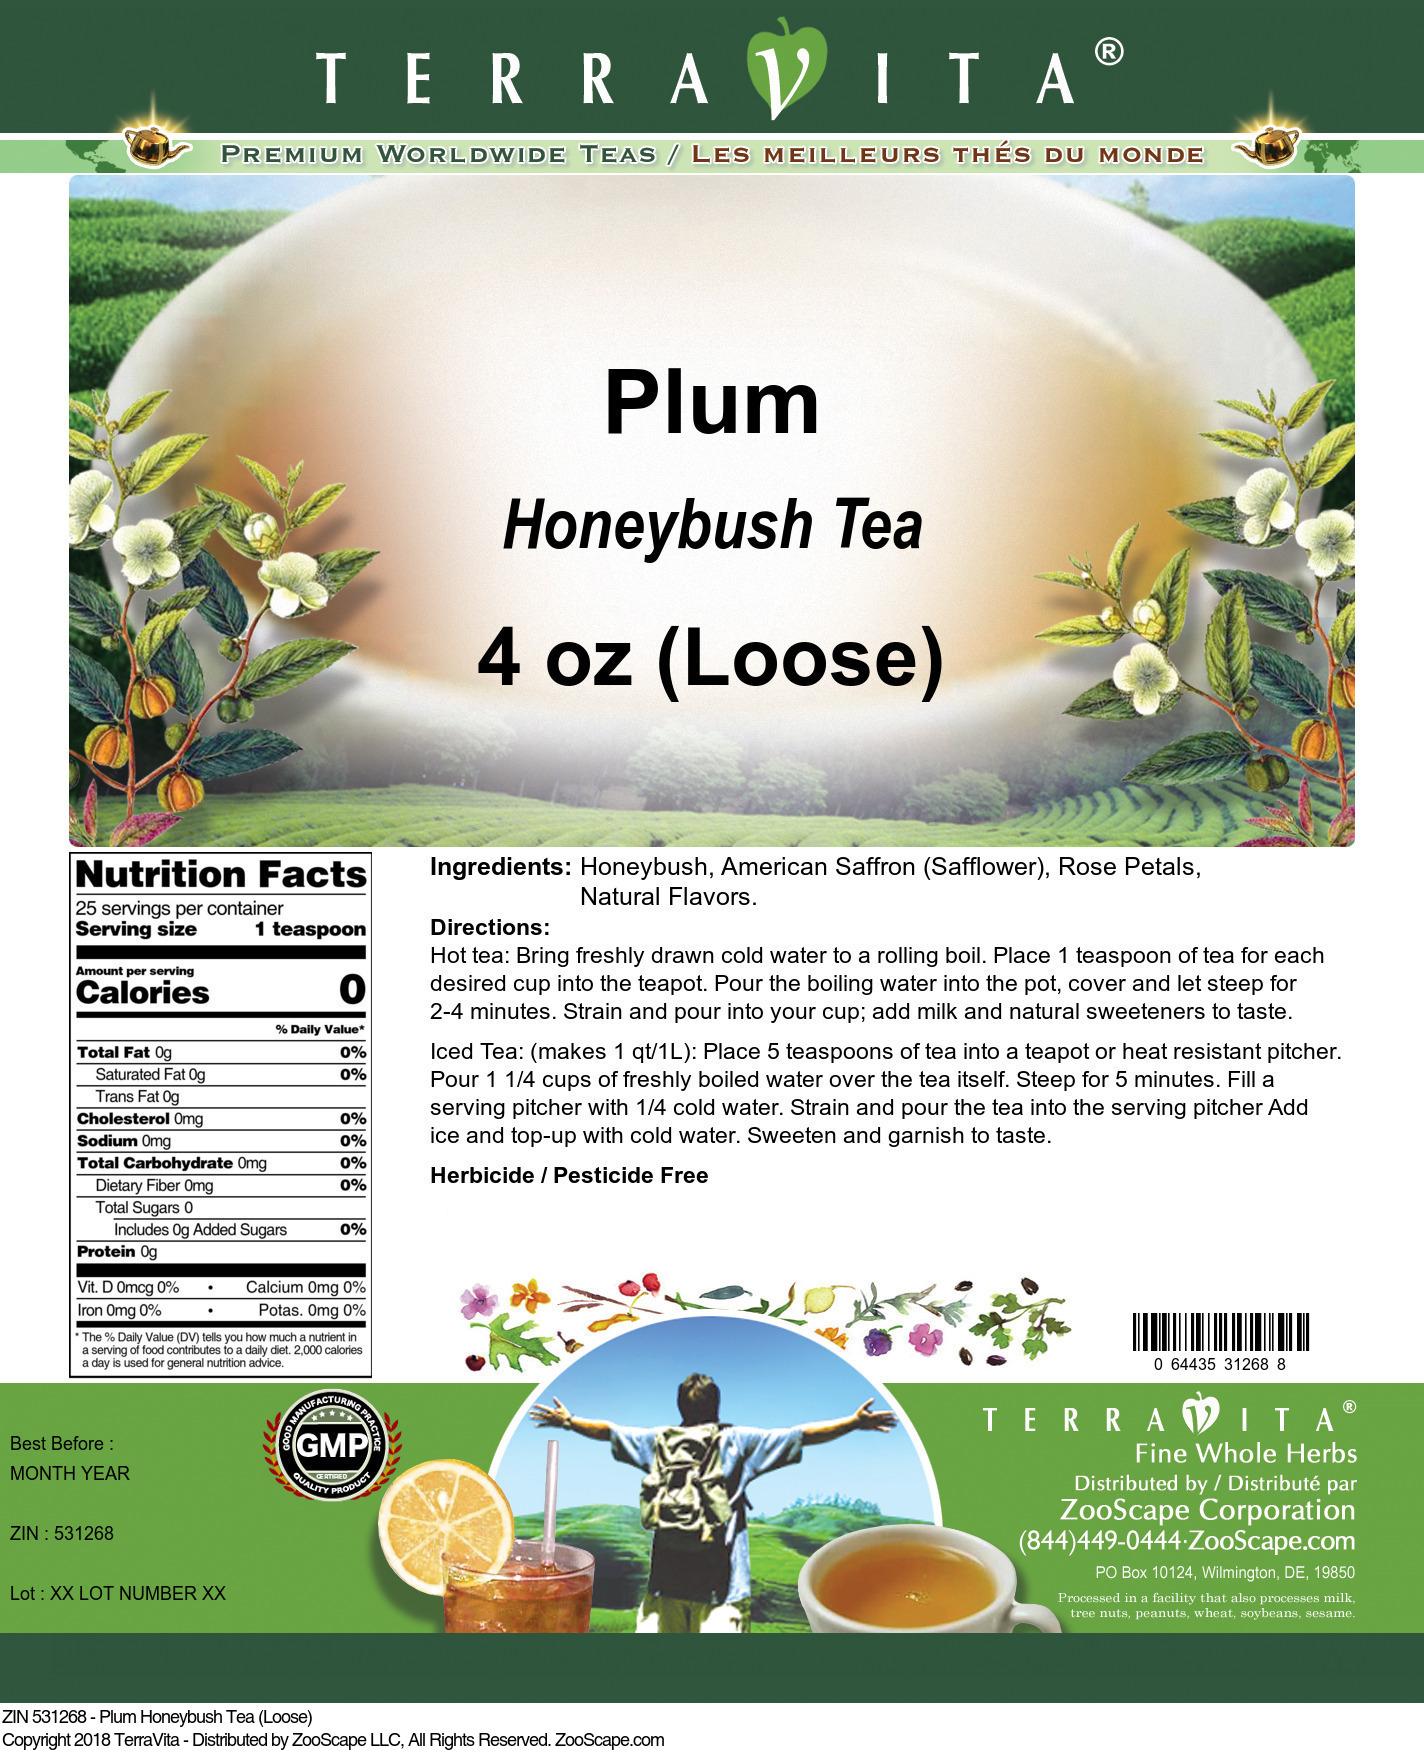 Plum Honeybush Tea